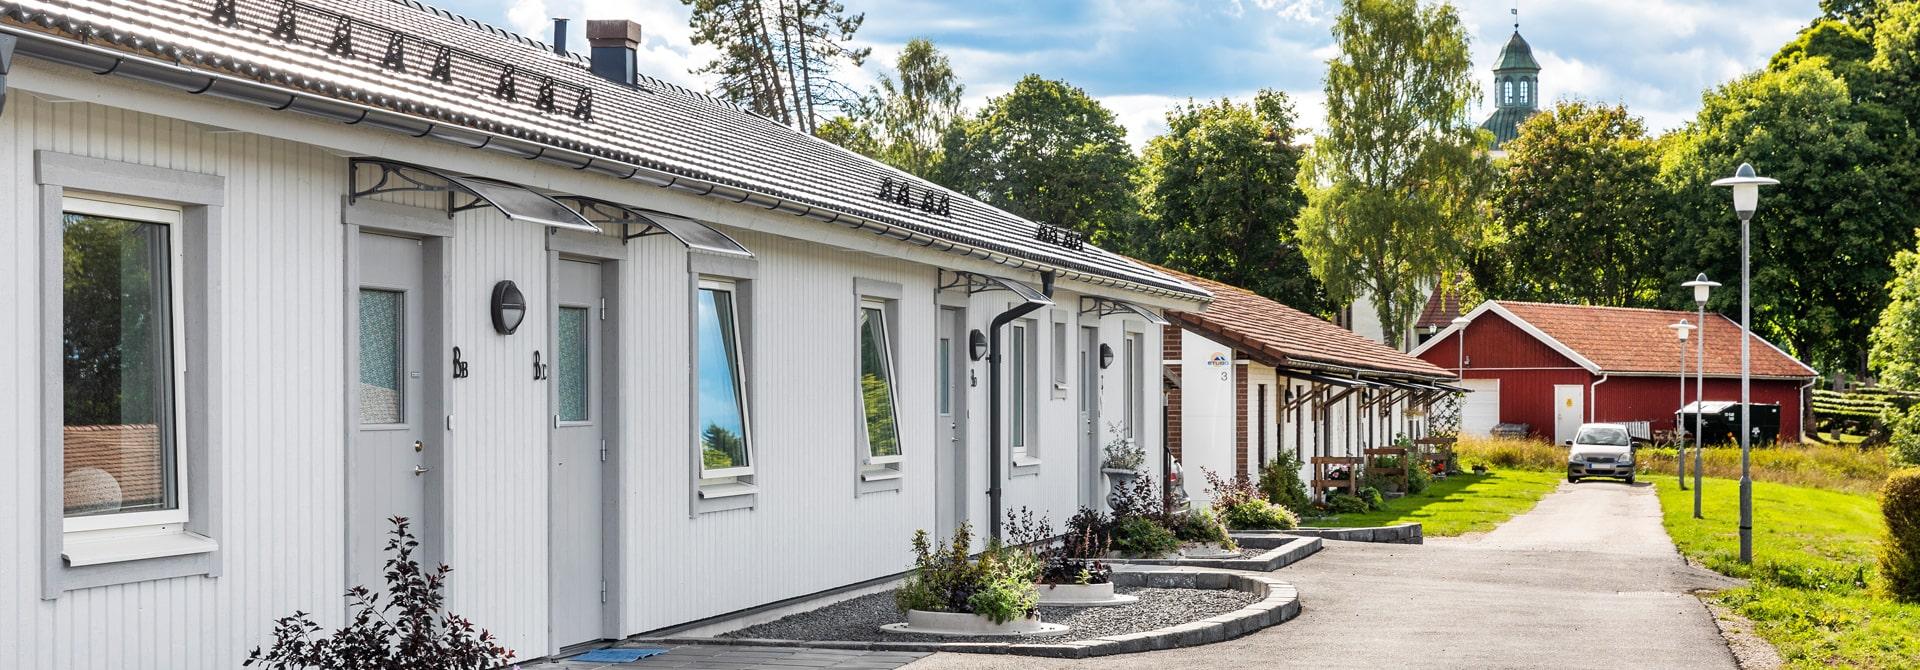 Prästgårdsliden, Ulricehamn